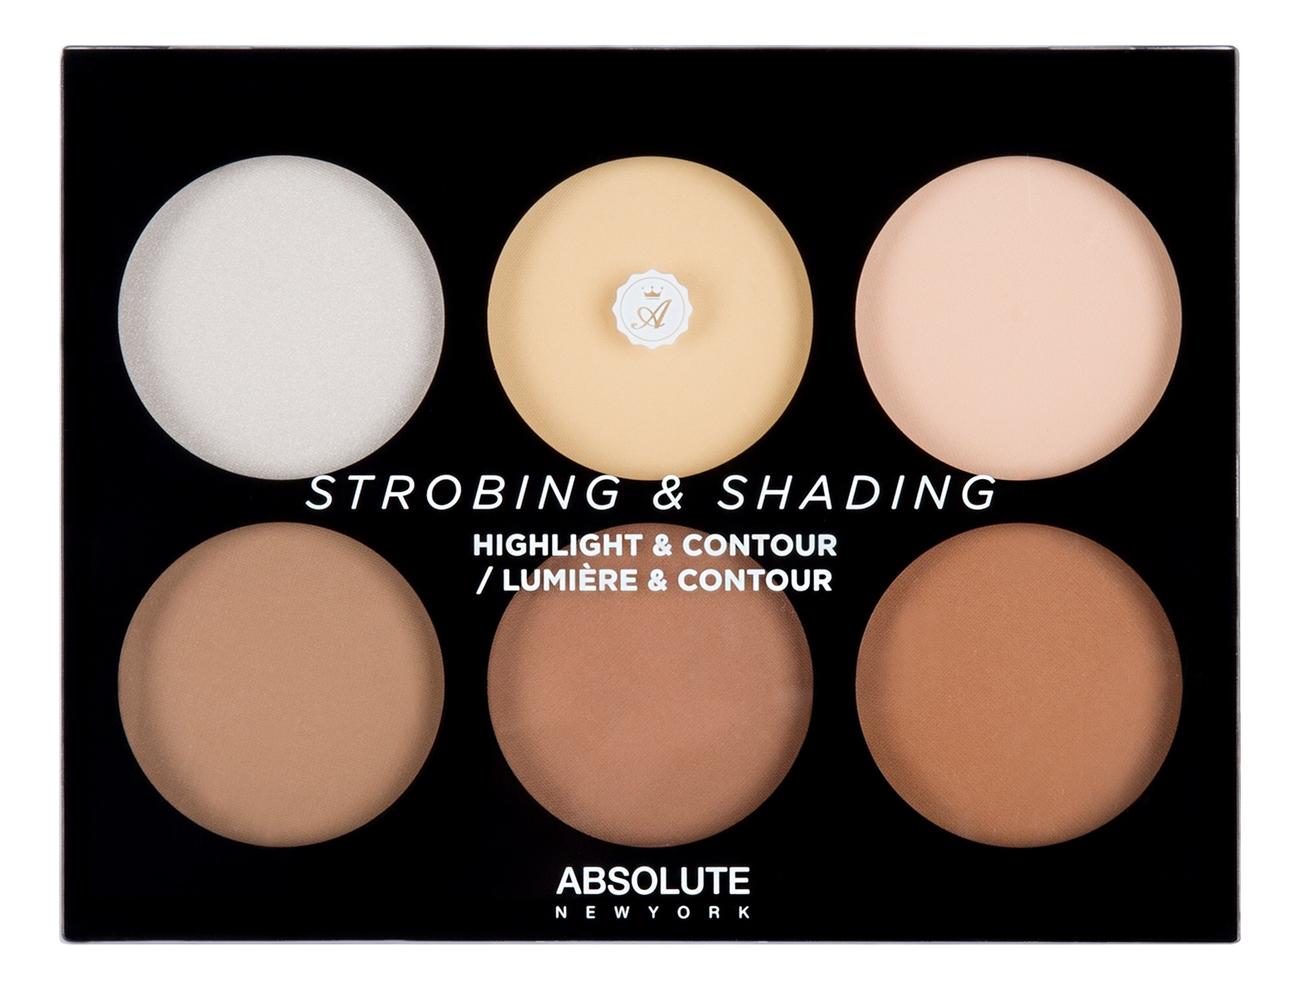 Палетка для контурирования лица Strobing & Shading 12г: AHC01 Light To Medium kiss new york professional палетка хайлайтеров для стробинга halo strobing light 3 х 5 27 г